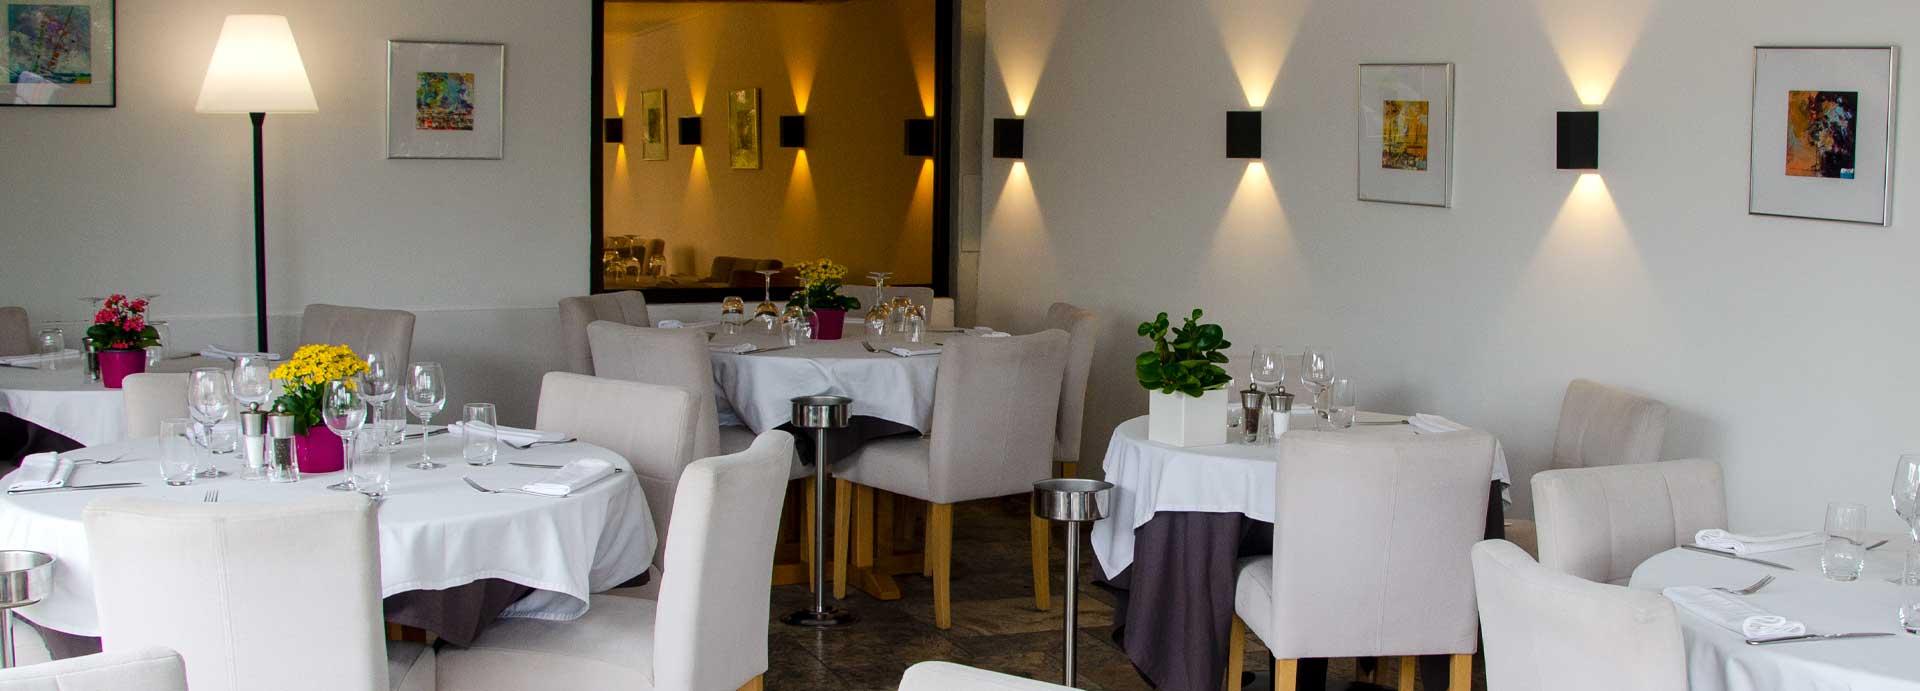 l-hermitage-restaurant-ste-maxime-2021-banner-1